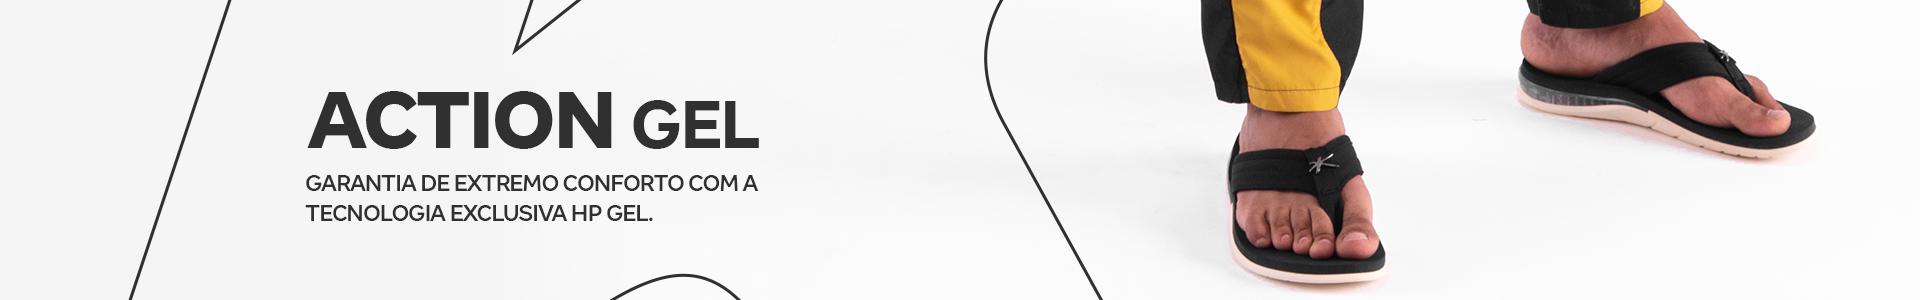 banner-desktop-action-gel